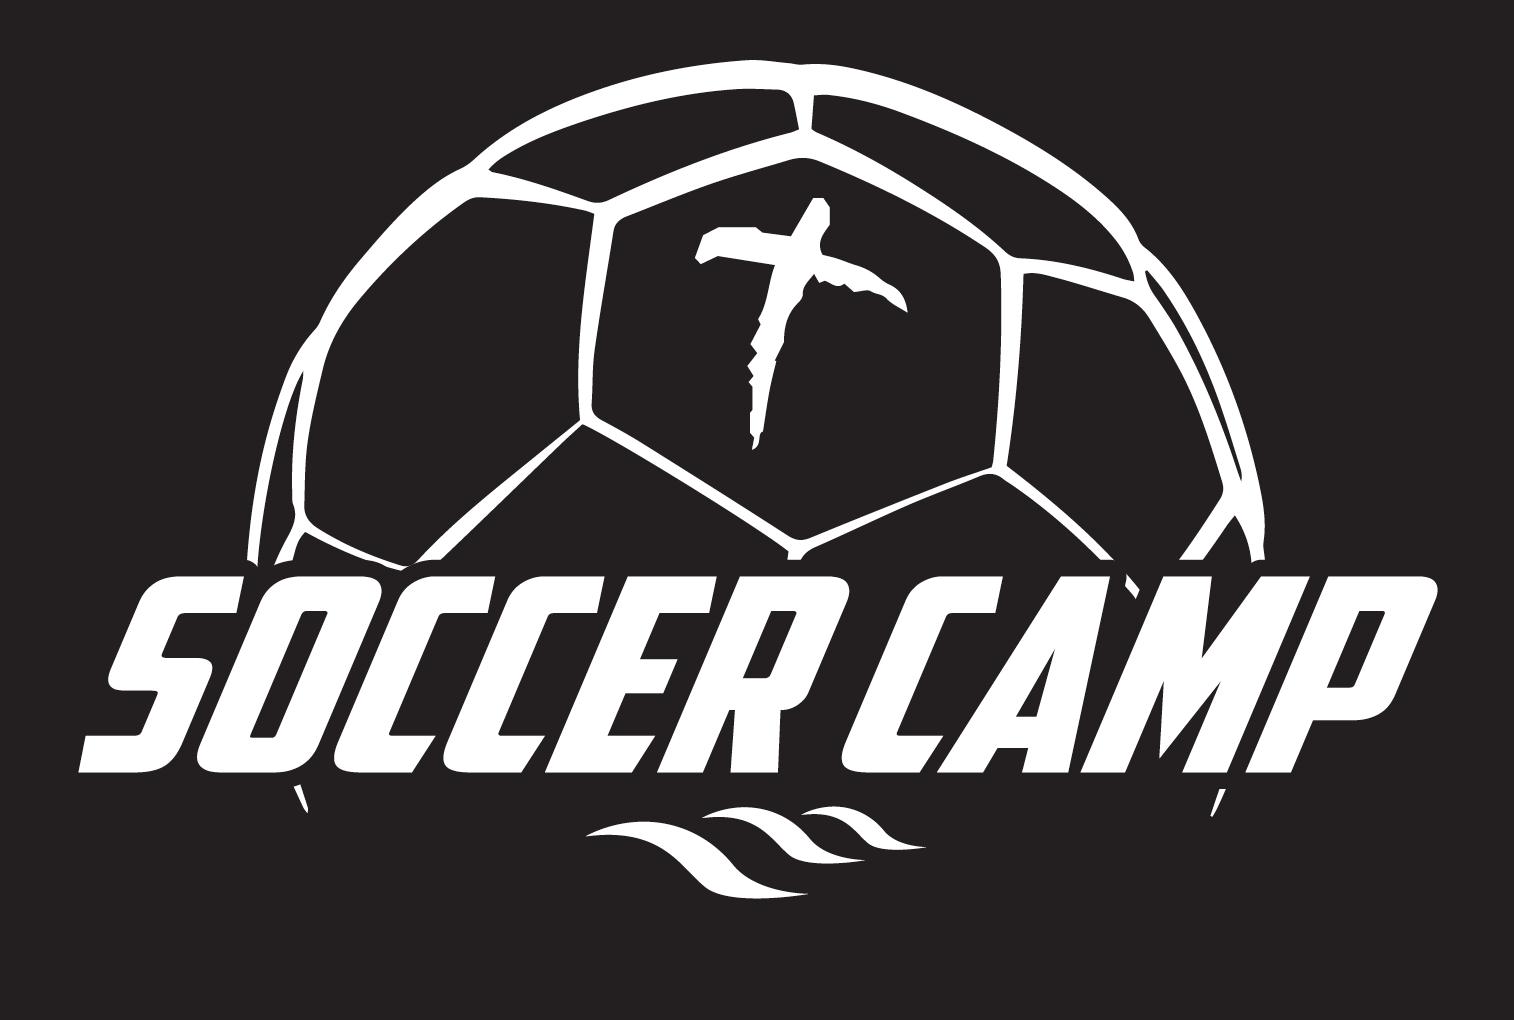 Soccer camp logo